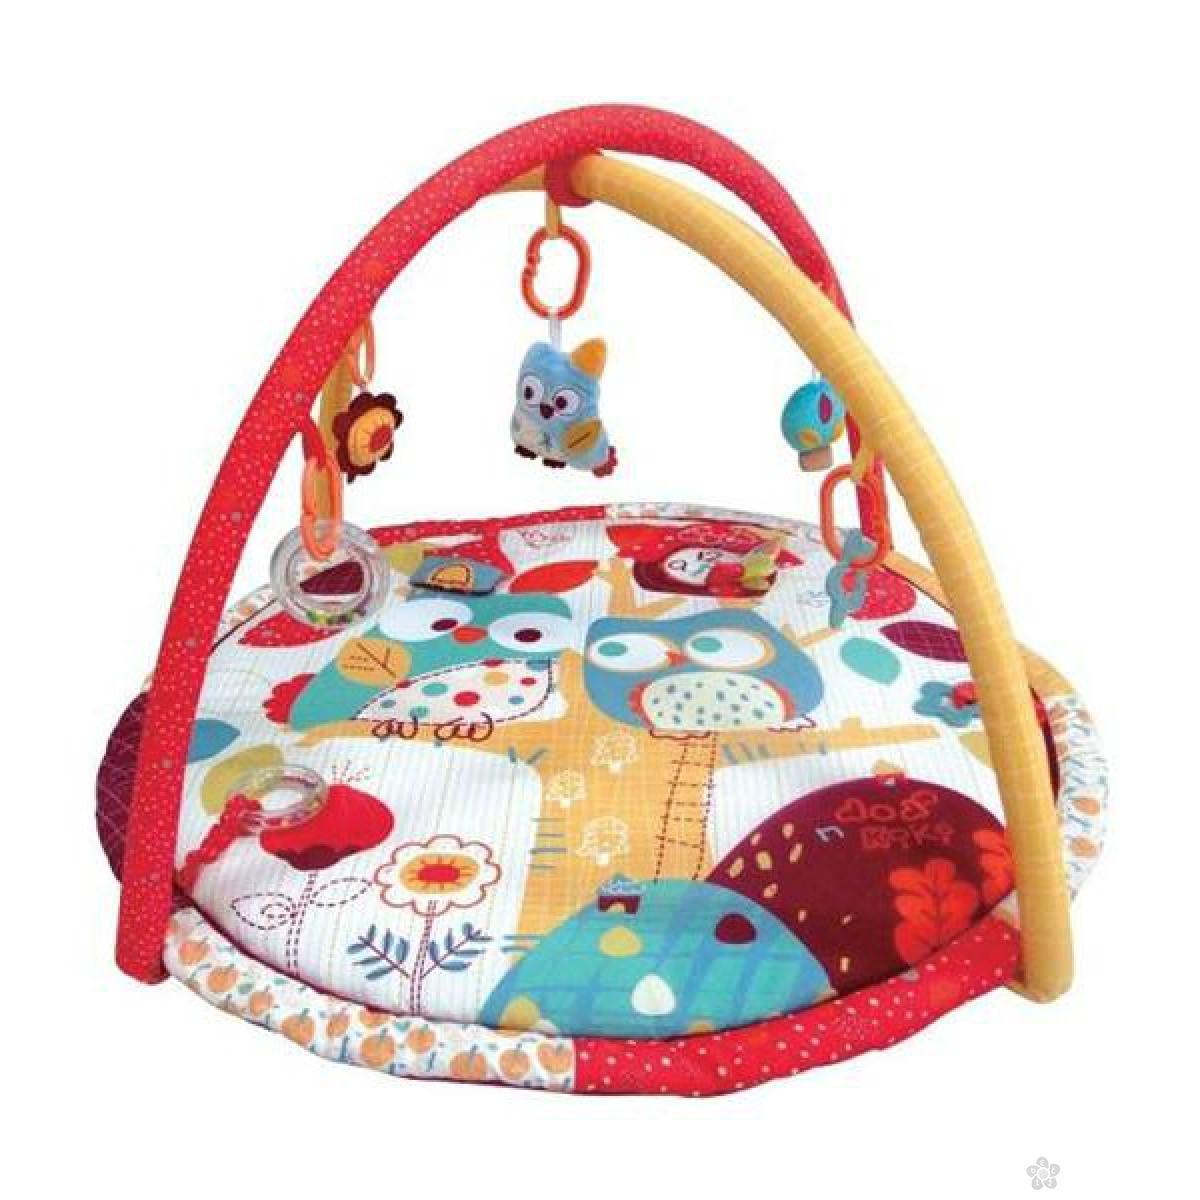 Baby Podloga za Igru Birdies, 31201010003